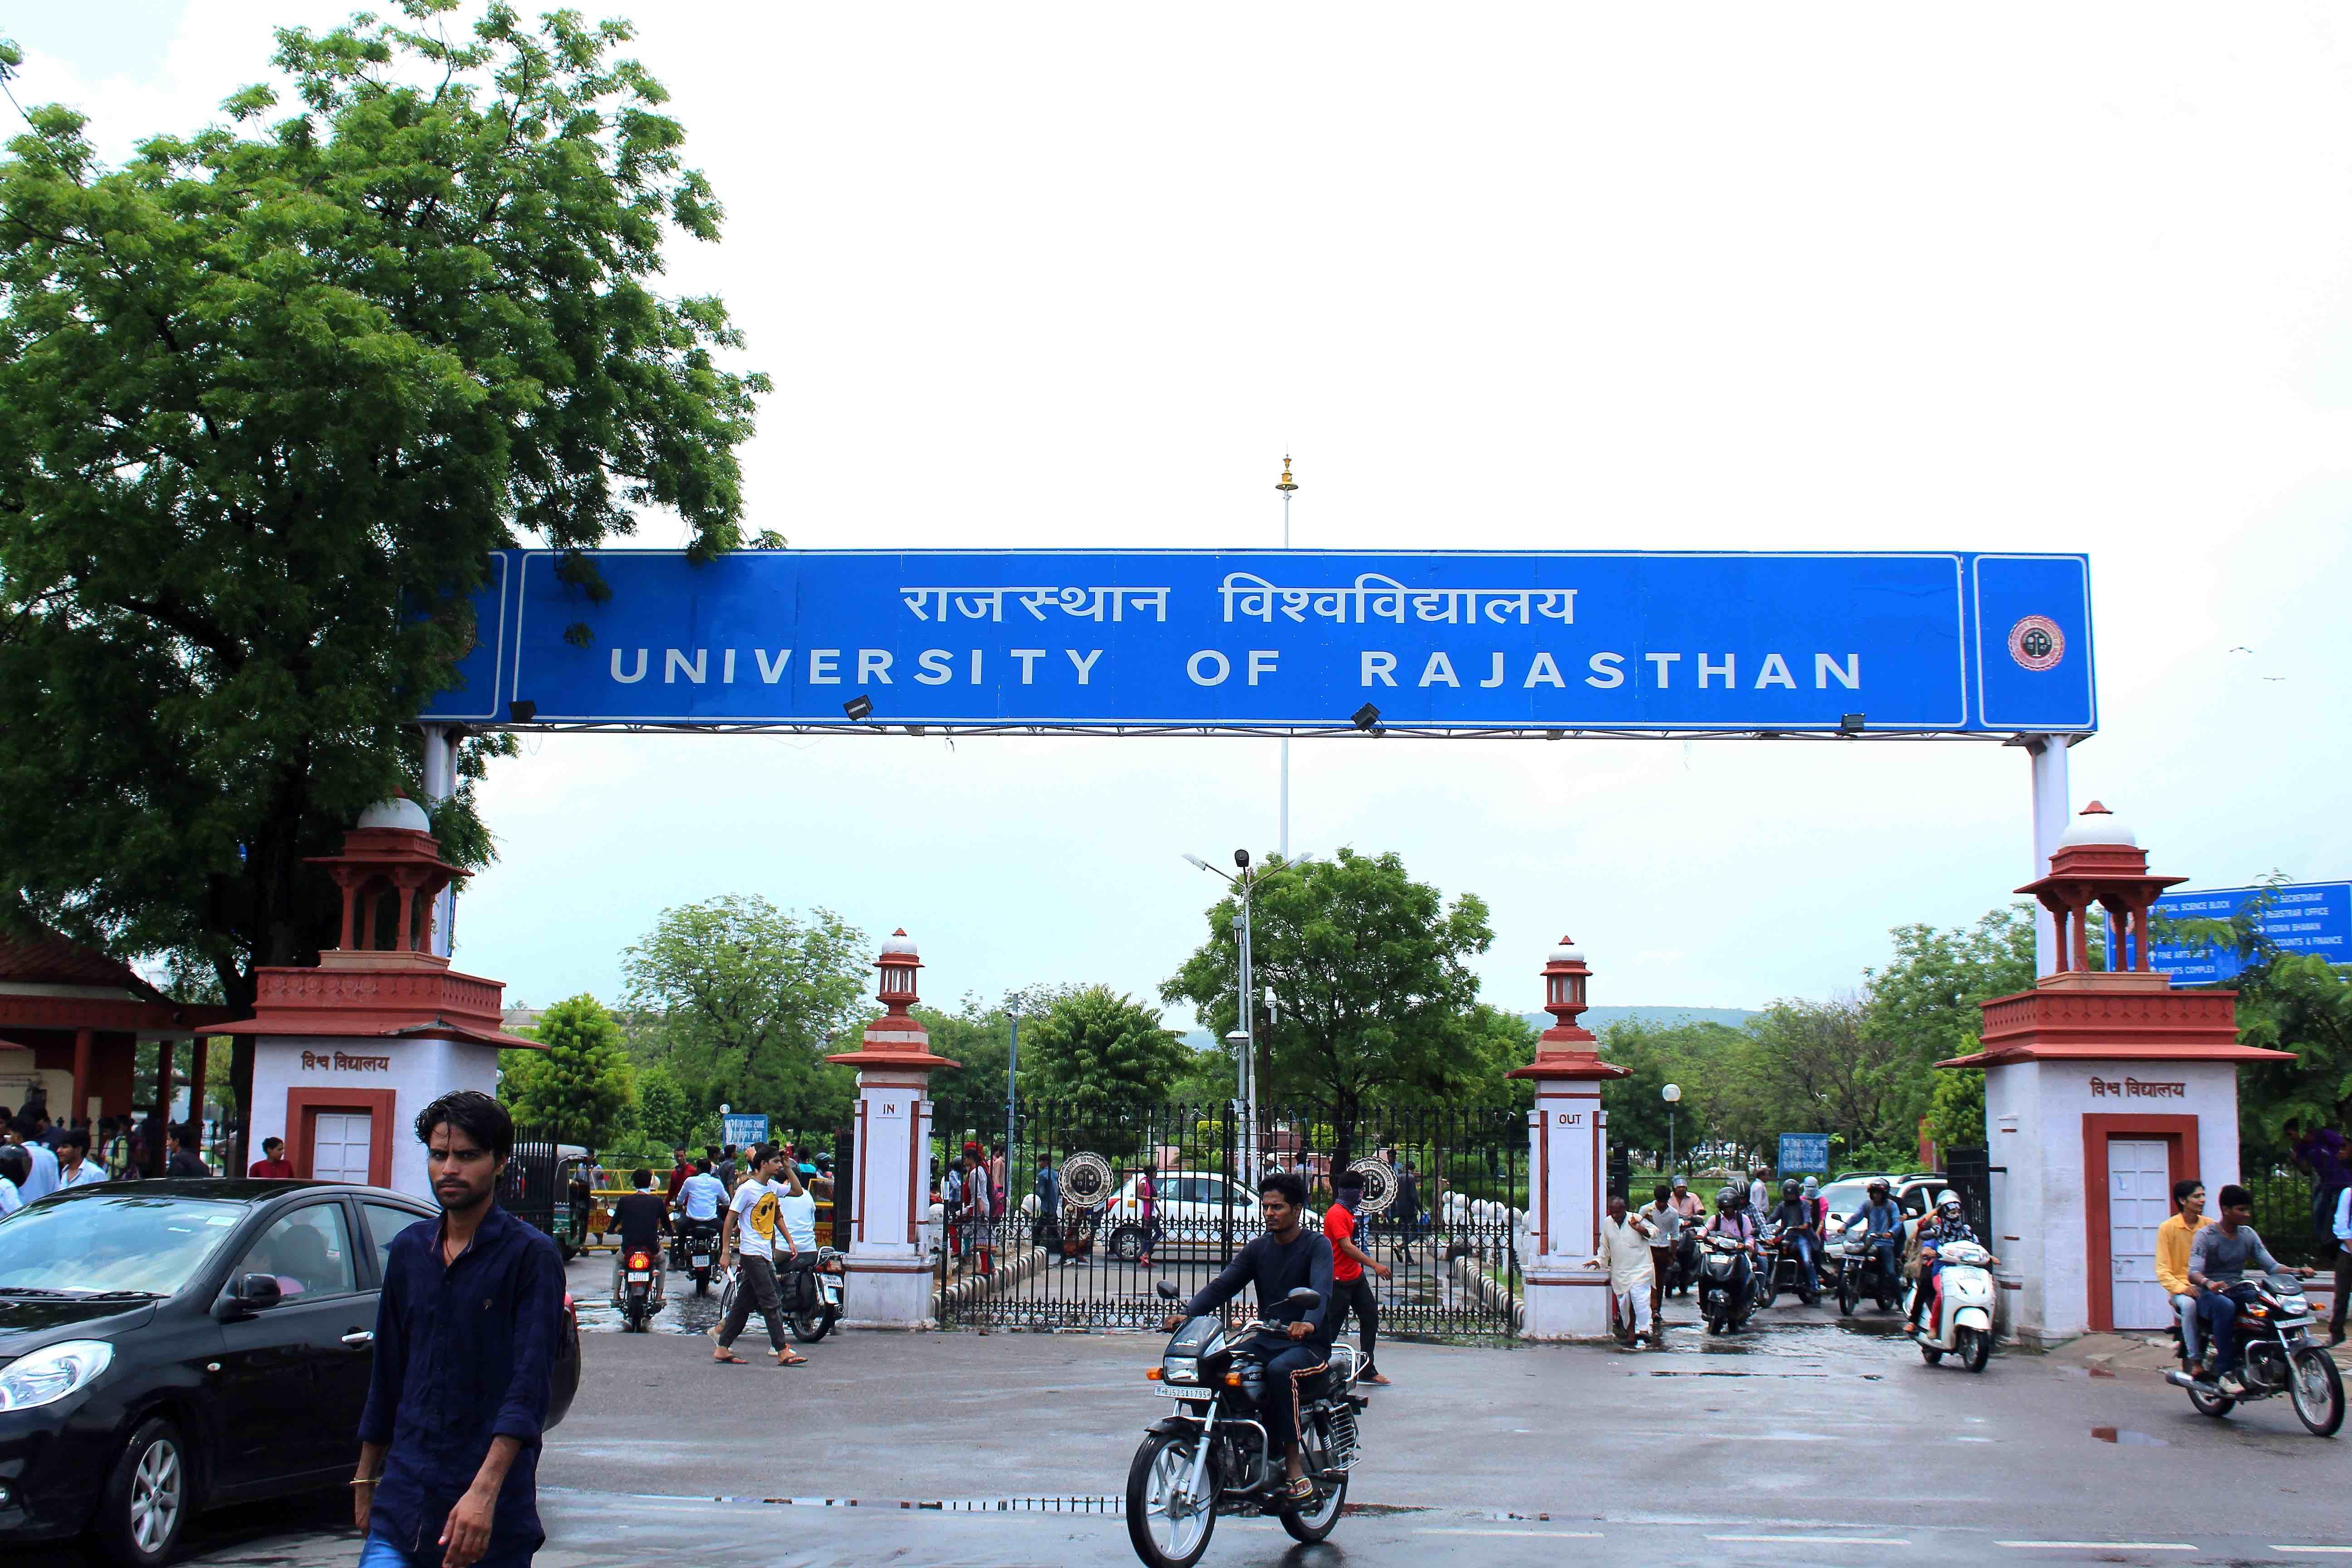 Entrance of the University of Rajasthan. Credit: Shruti Jain